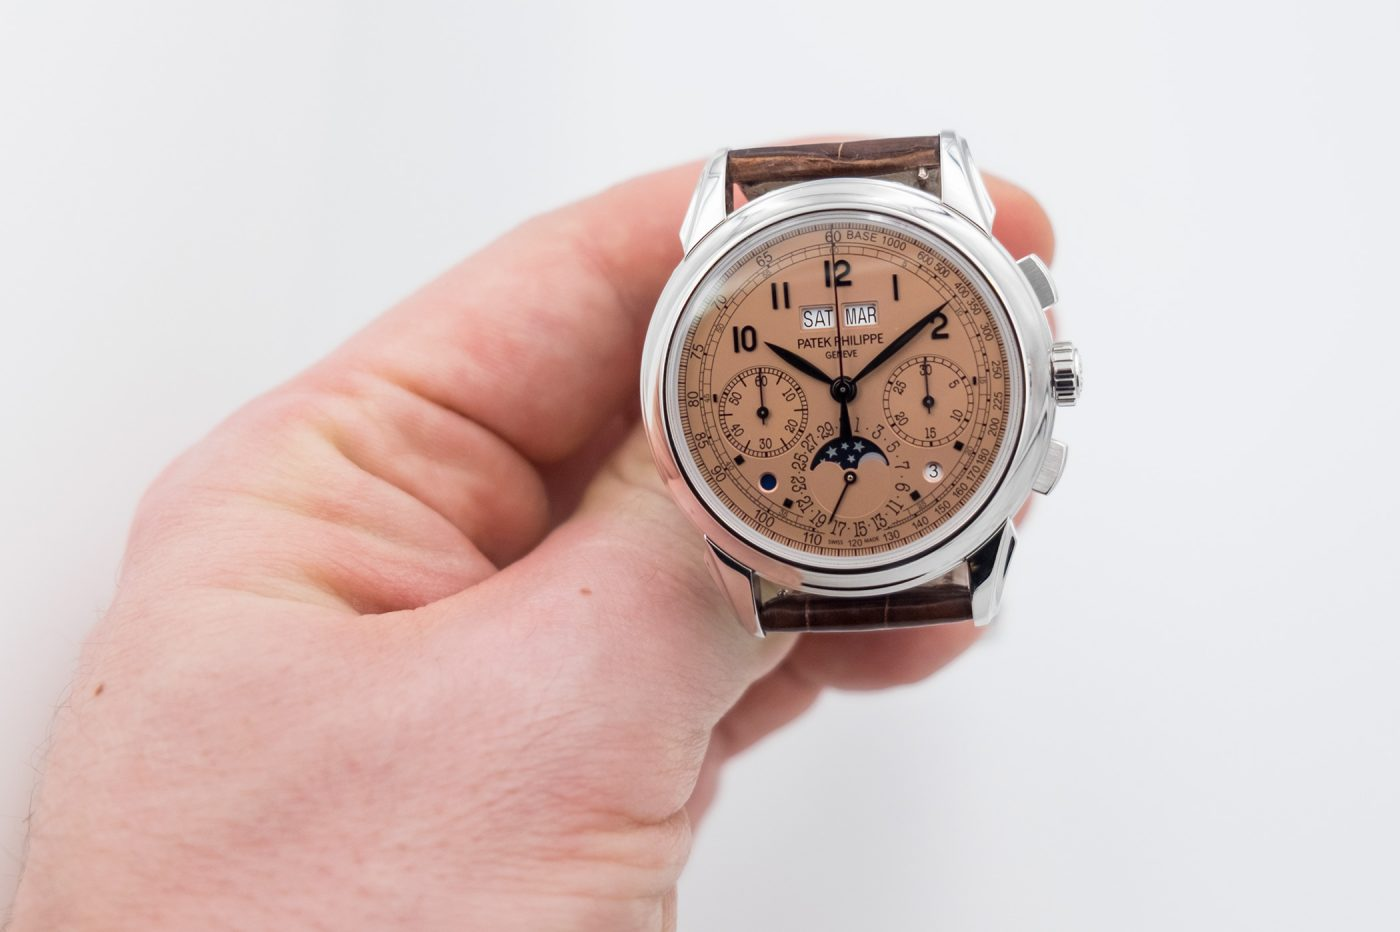 Patek Philippe Chronograph Perpetual Calendar Ref.5207P-001 –  teraz w platynie – Basel 2018 [zdjęcia live, cena]